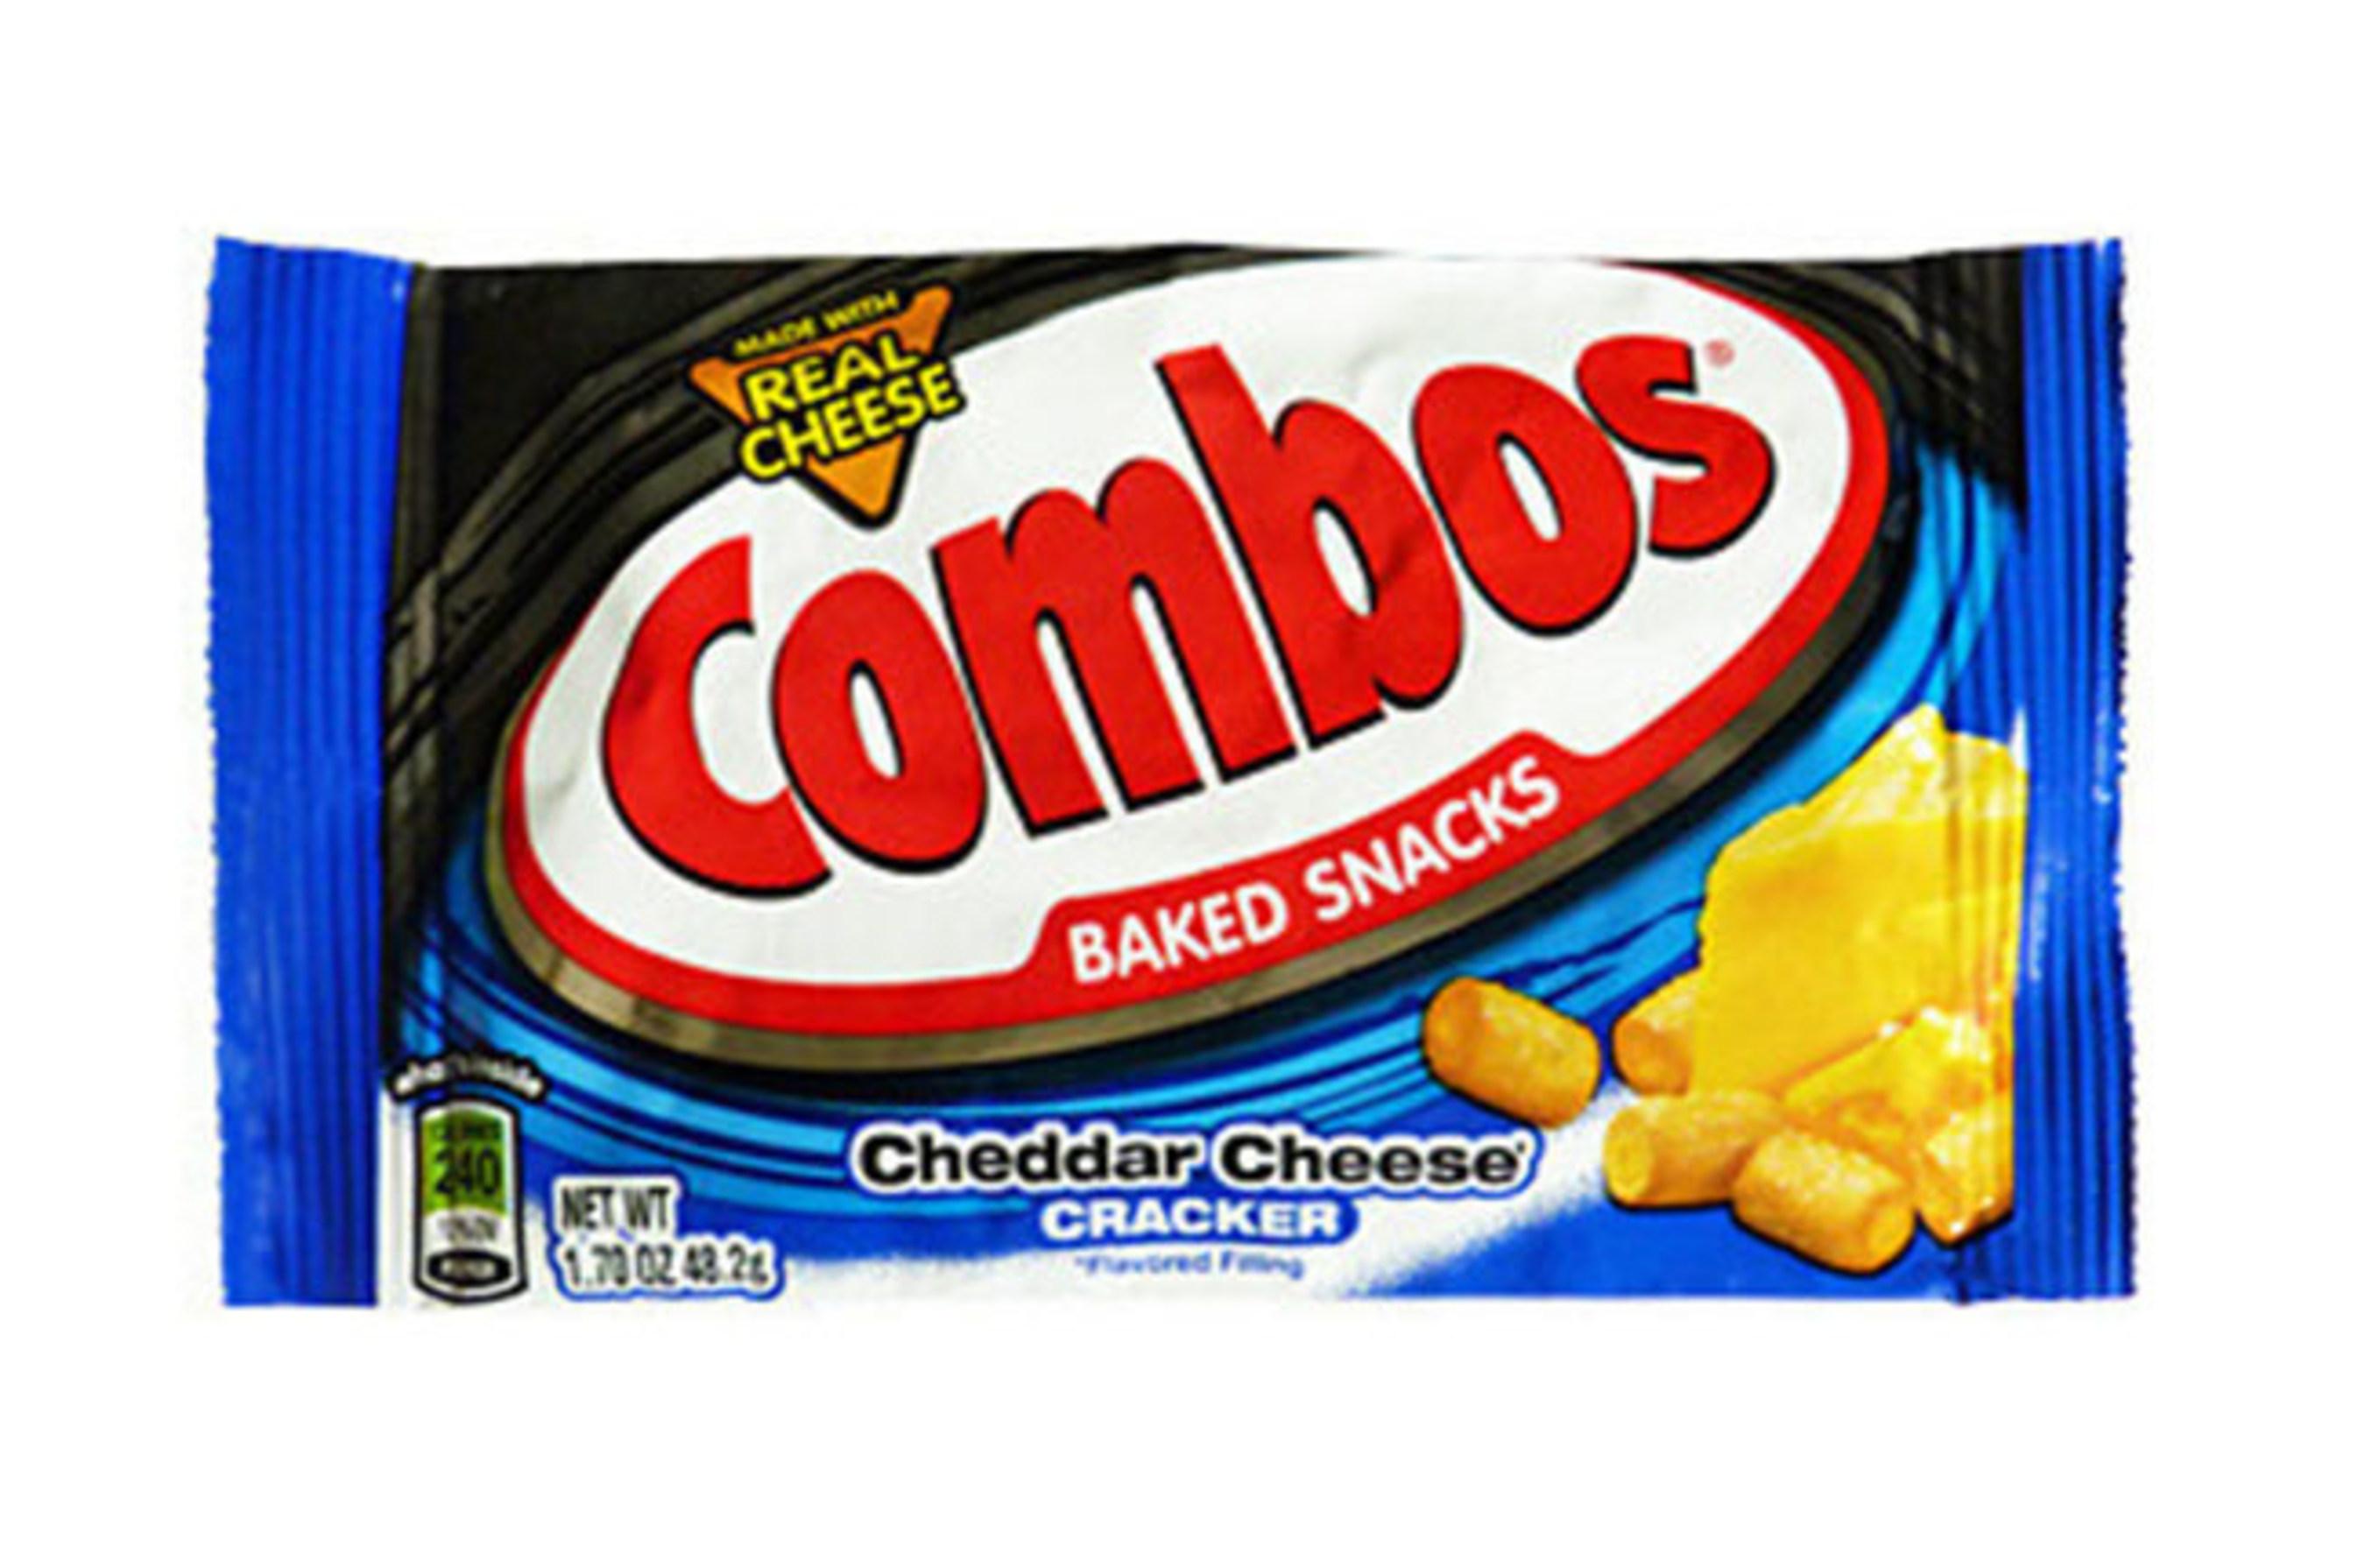 COMBOS SNACKS CHEDDAR CHEESE CRACKER - SINGLES - 1.70 OZ - 18 CT - 12/CA